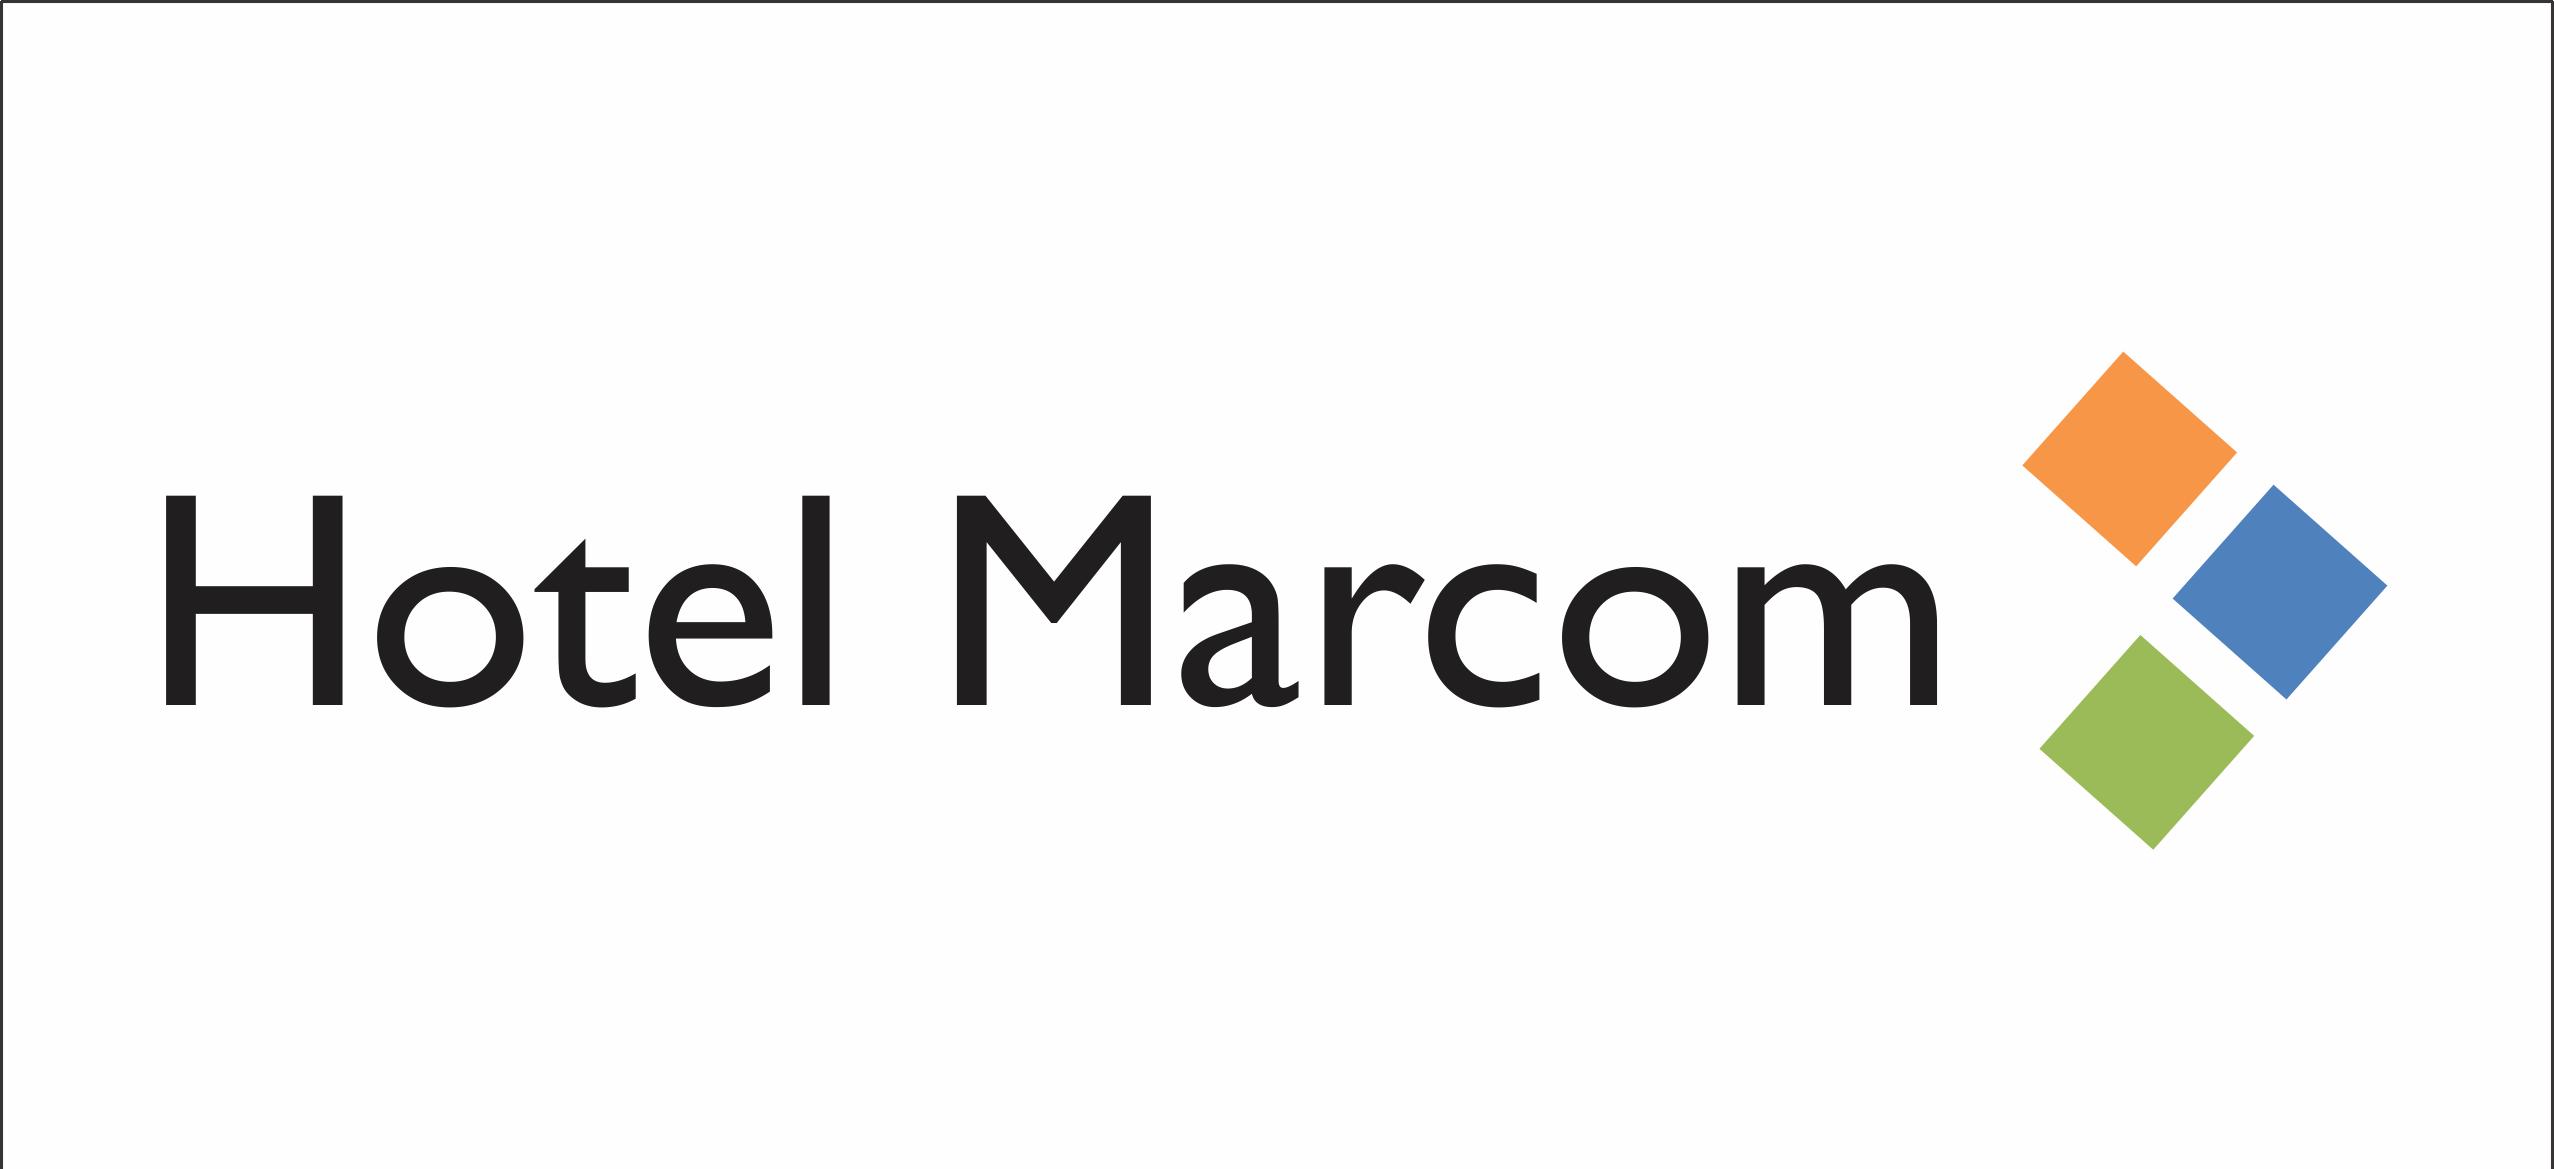 Hotel Marcom